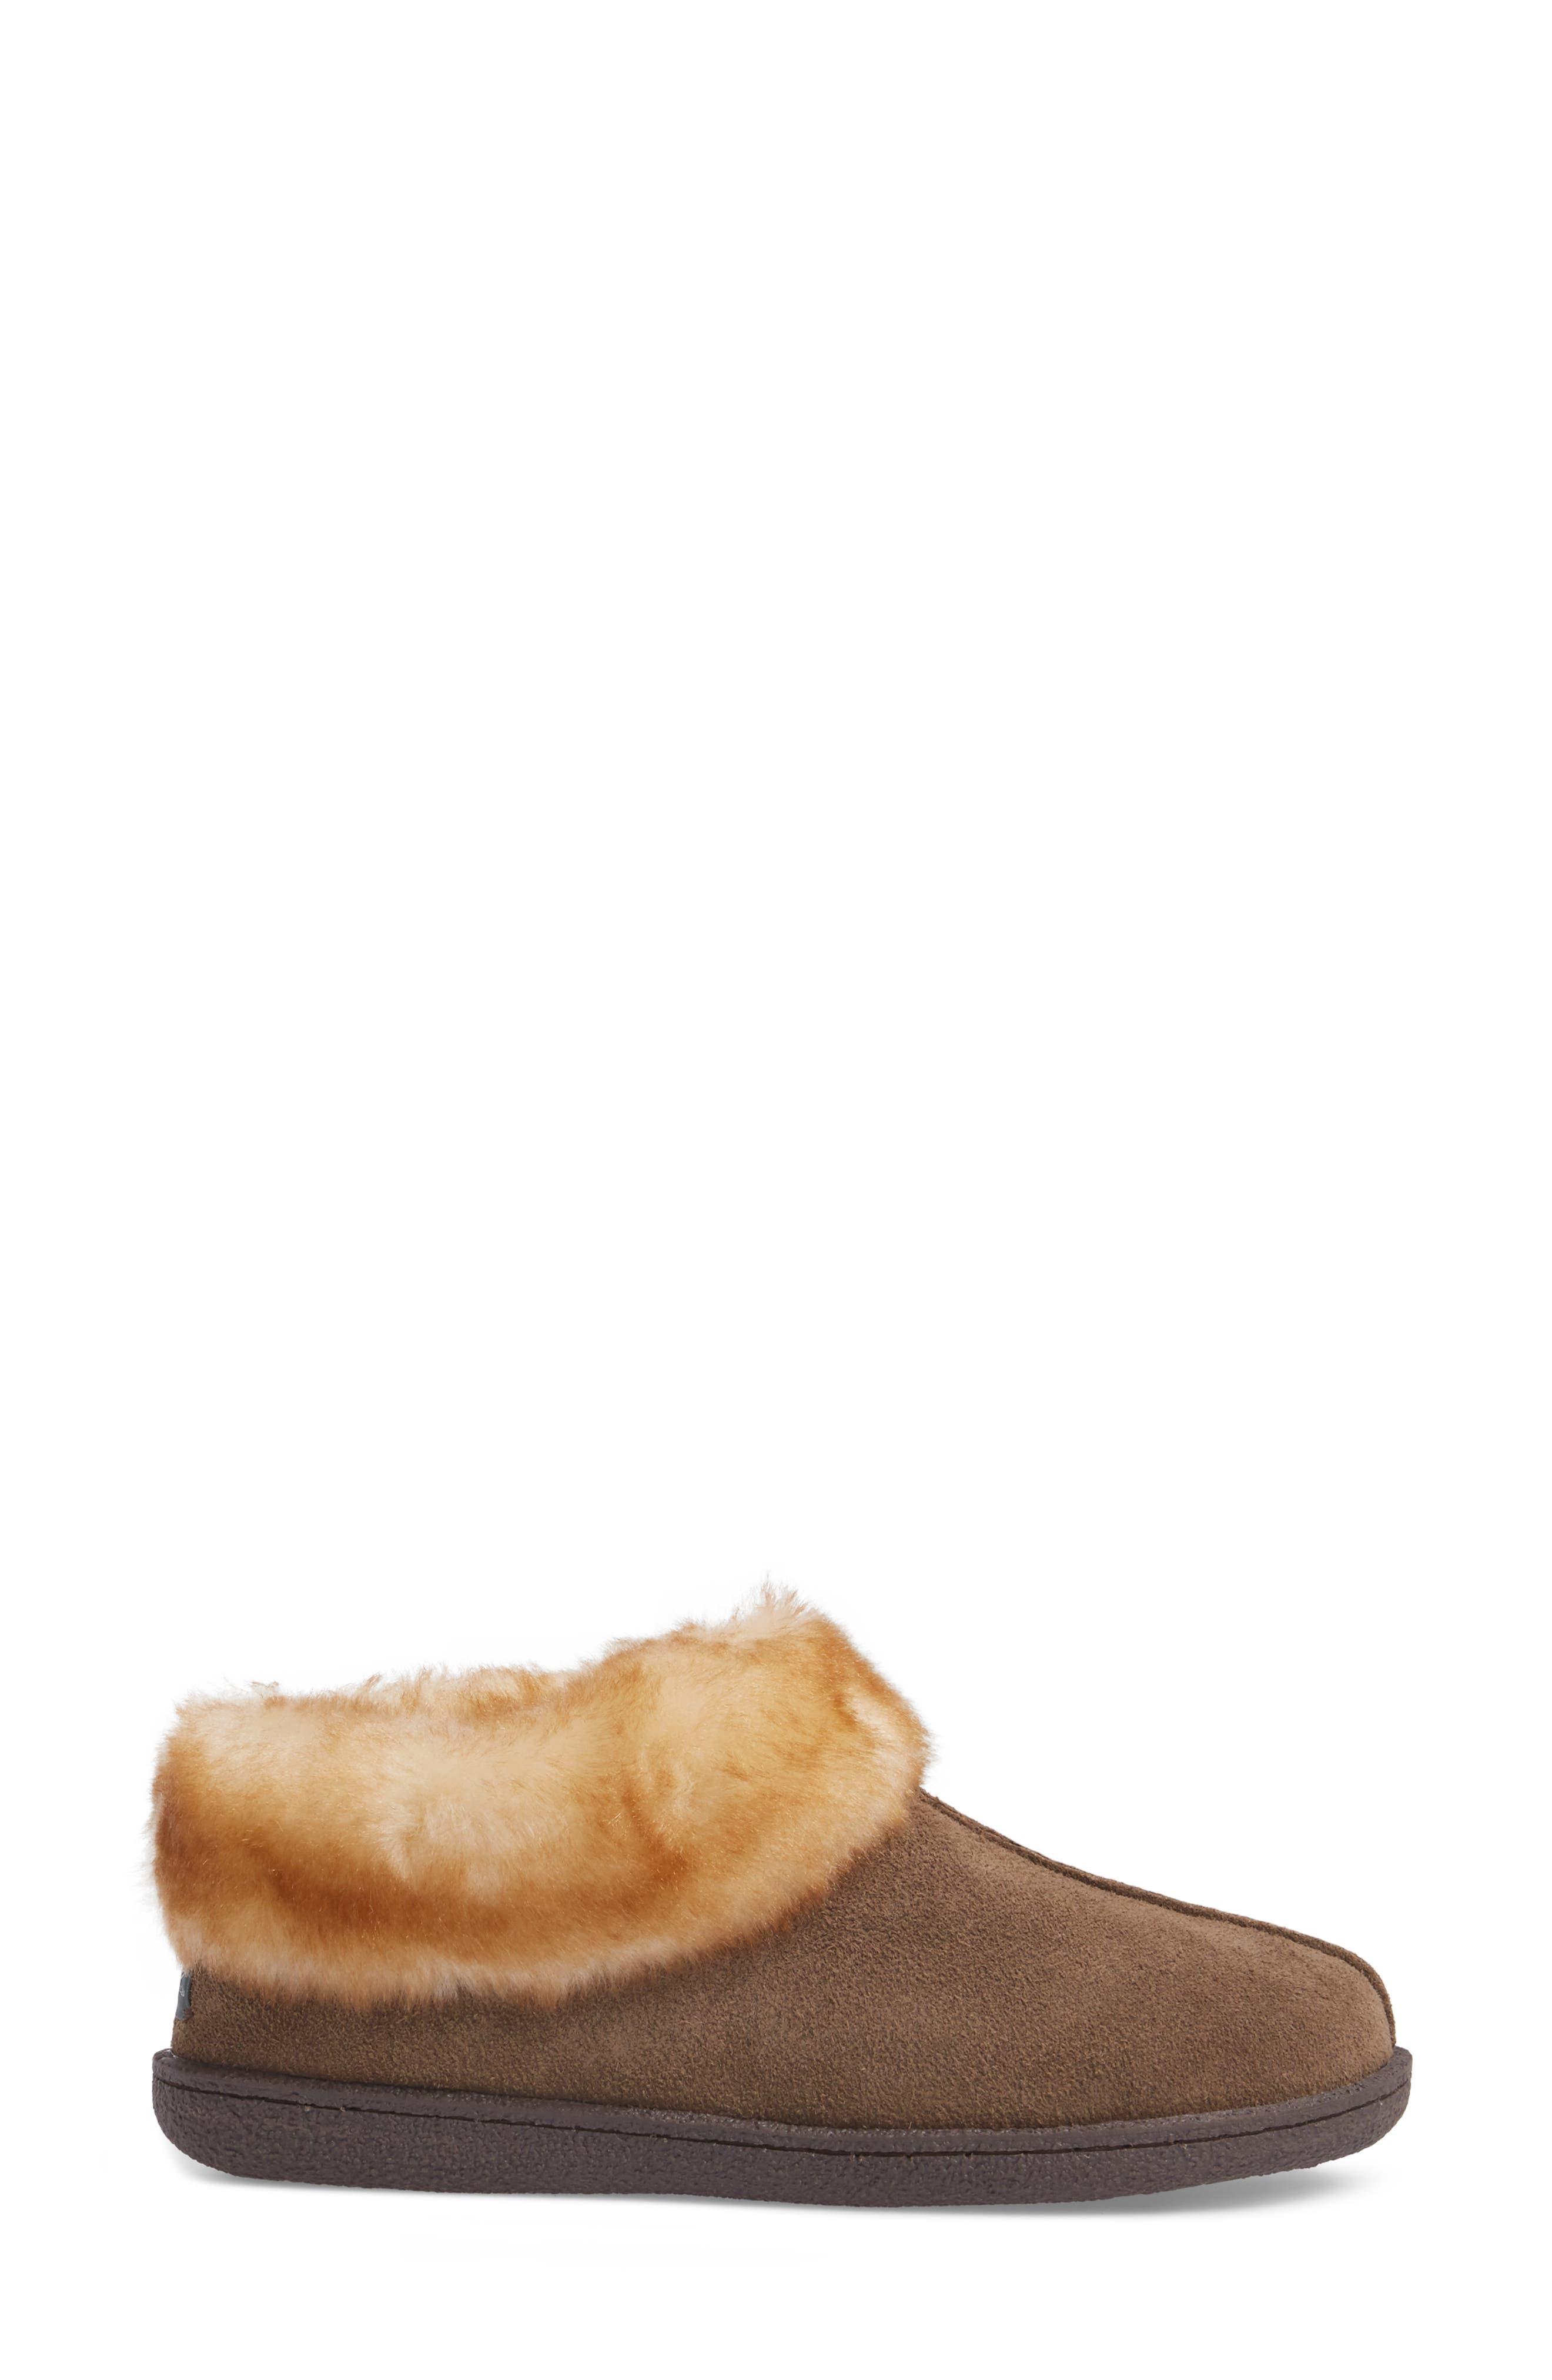 Autumn Ridge II Faux Fur Slipper Bootie,                             Alternate thumbnail 3, color,                             Walnut Suede